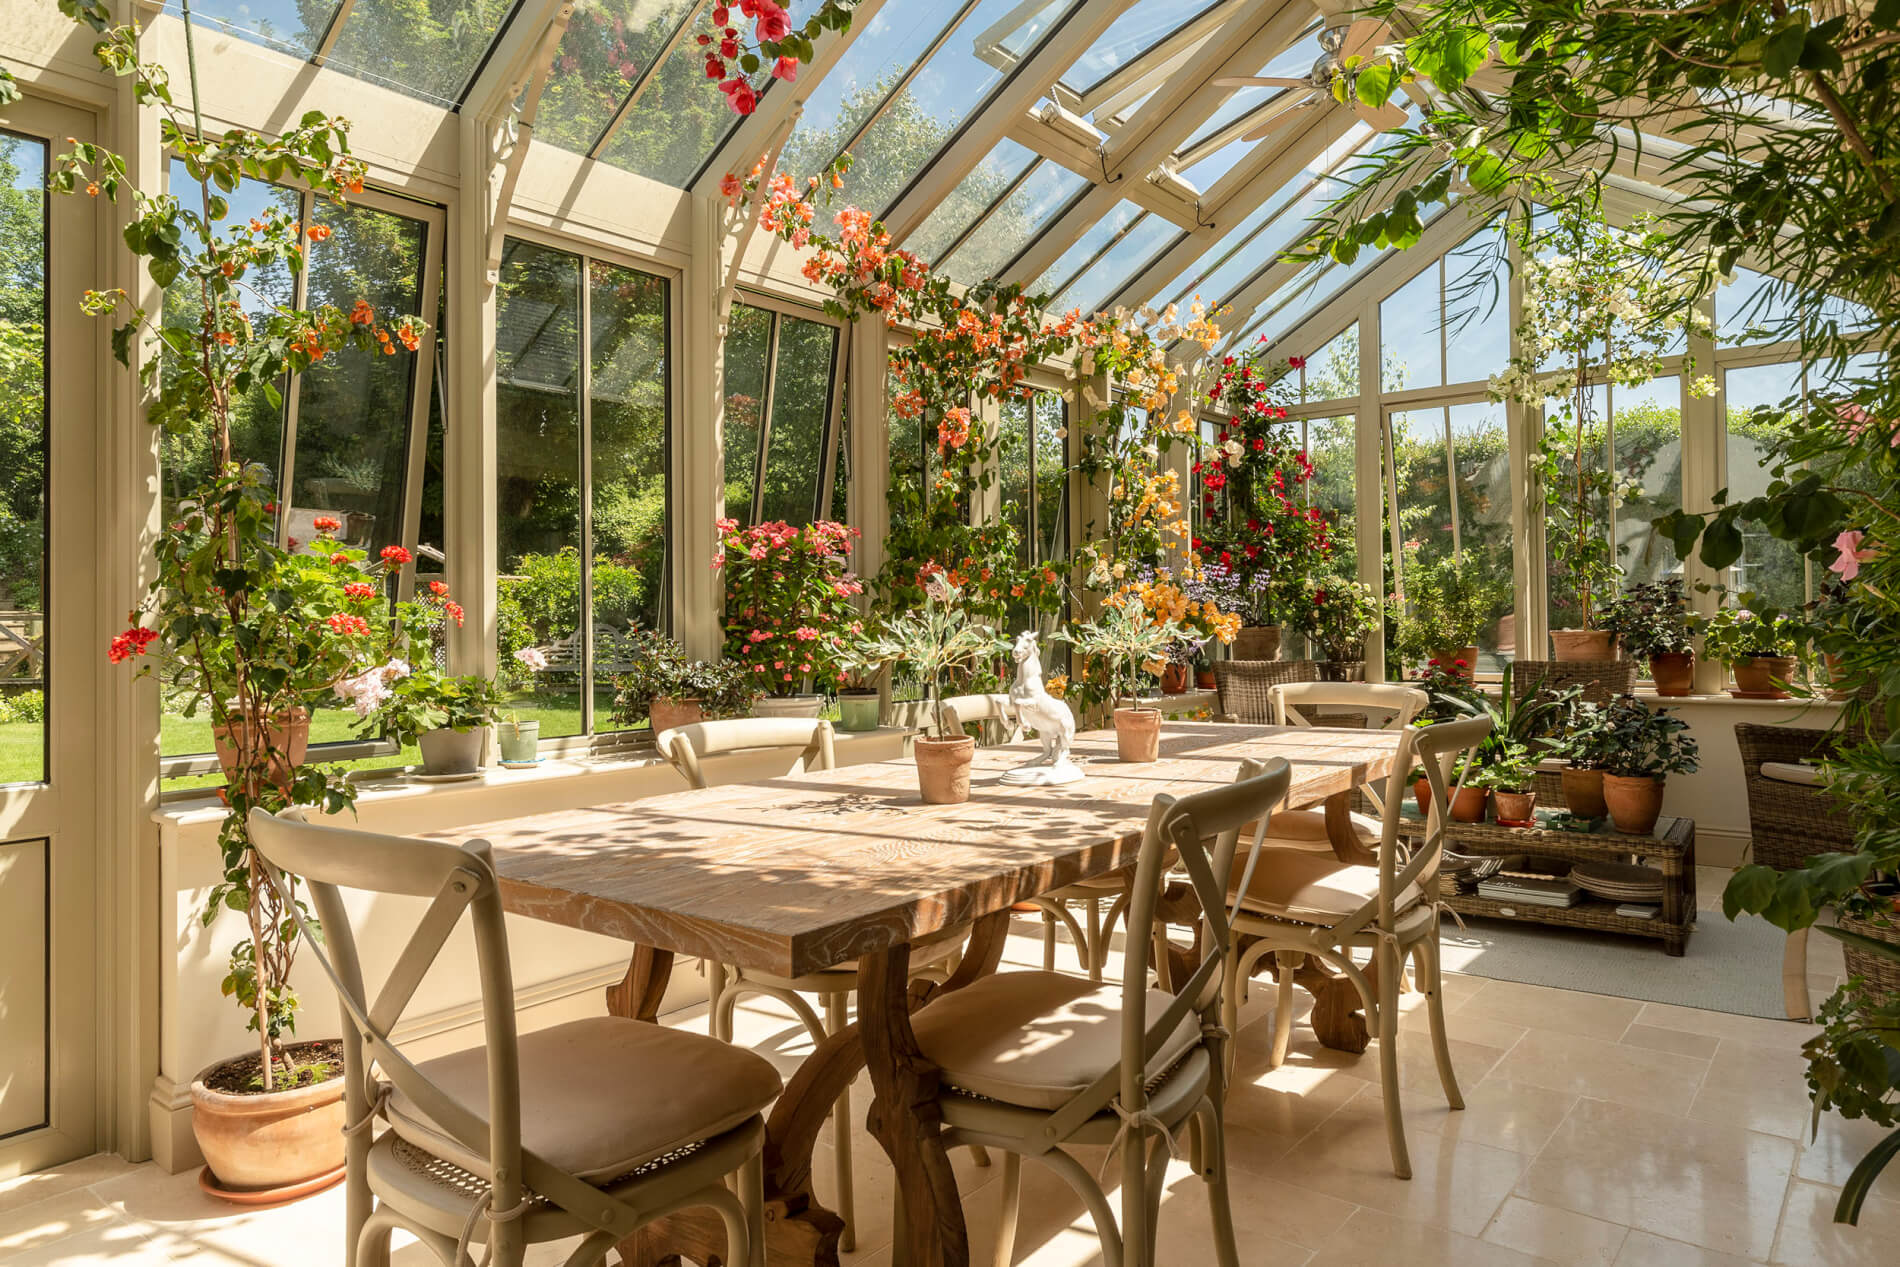 Conservatory Accessory Ideas - Plants